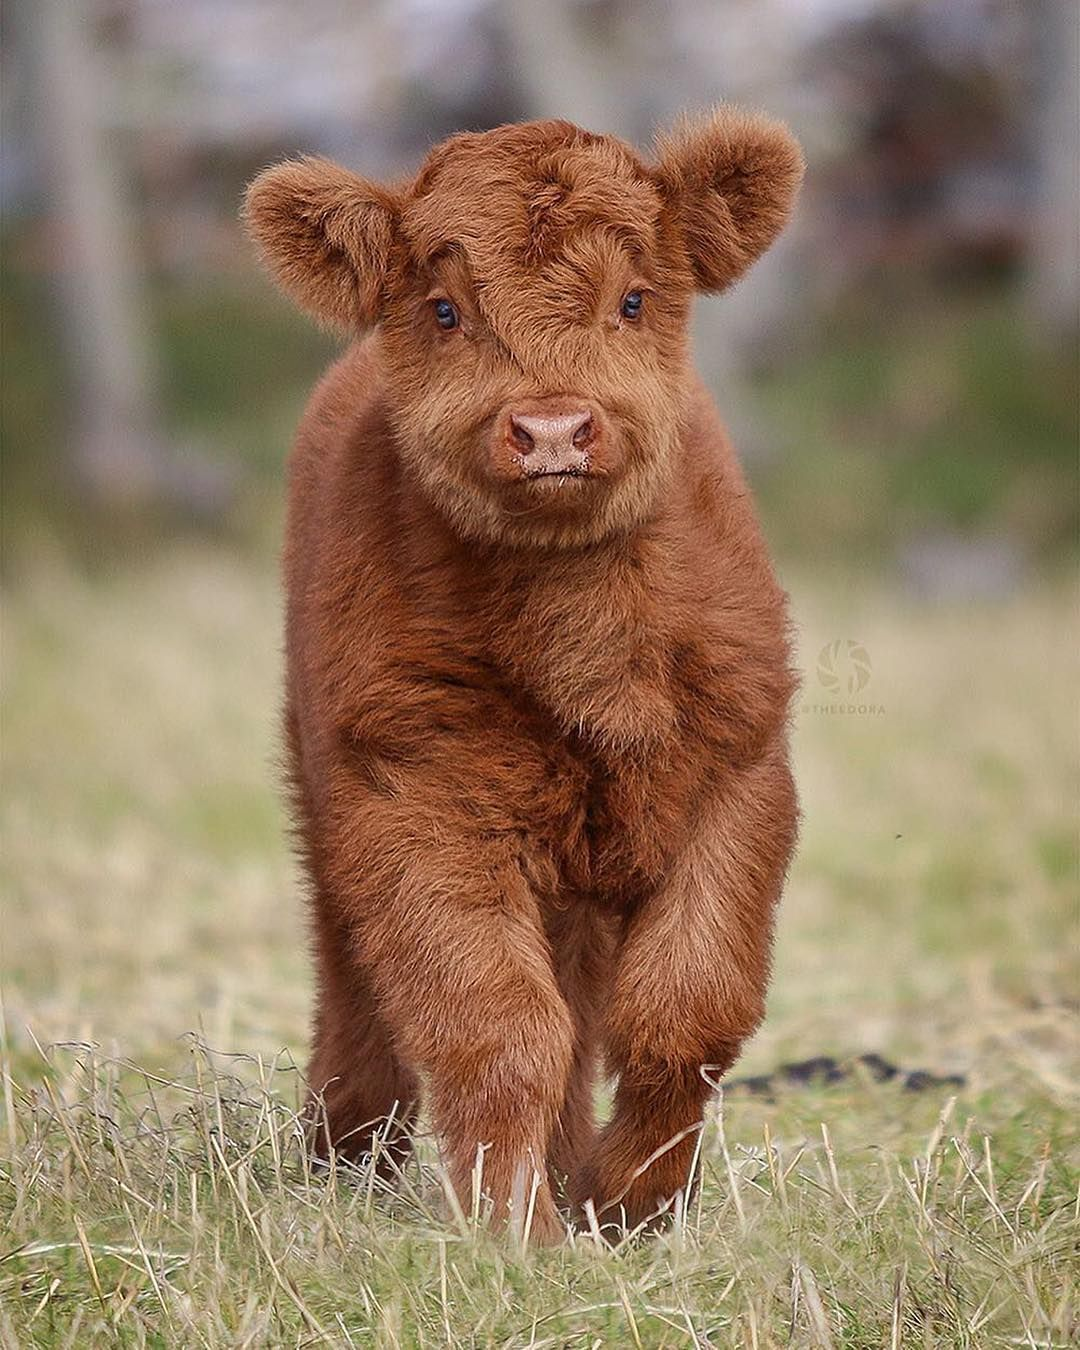 Pin by Tayyab Shafiq on Animals and pets | Pet cows, Cute ...